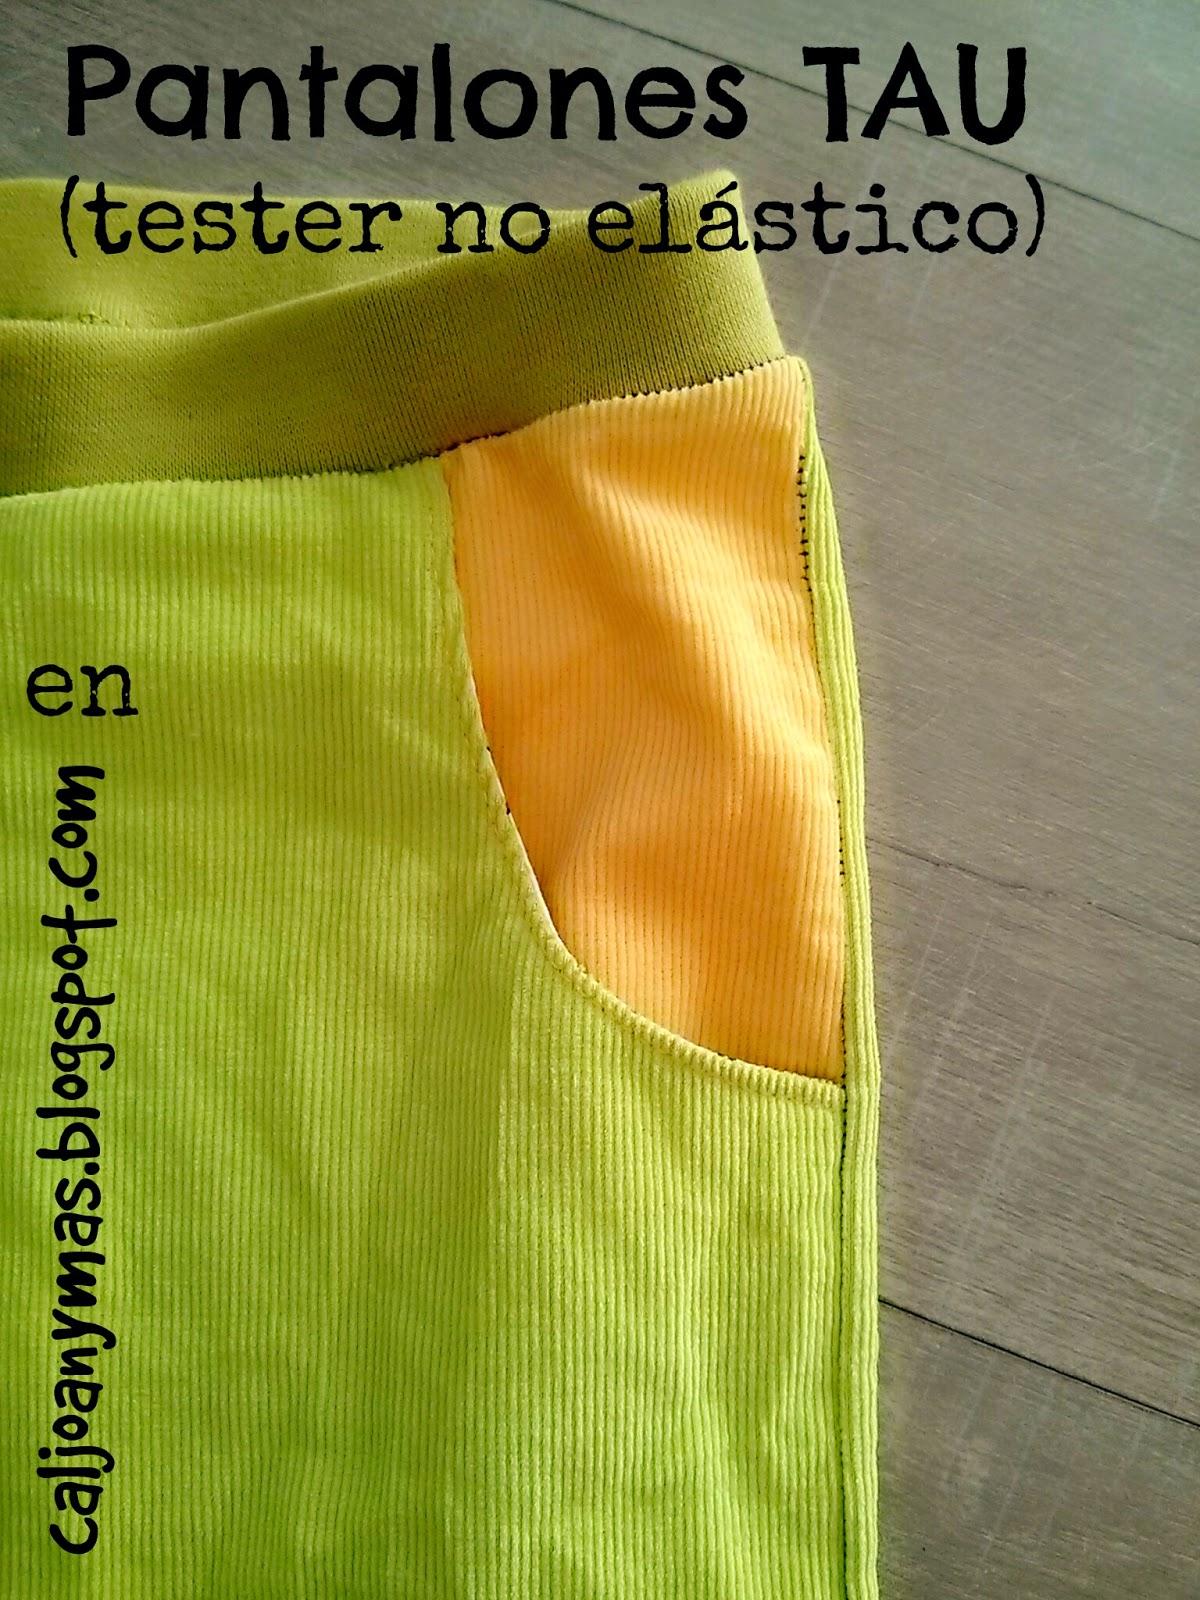 Cal Joan Y Mas Pantalones Tau Mrdm Tester No Elastico